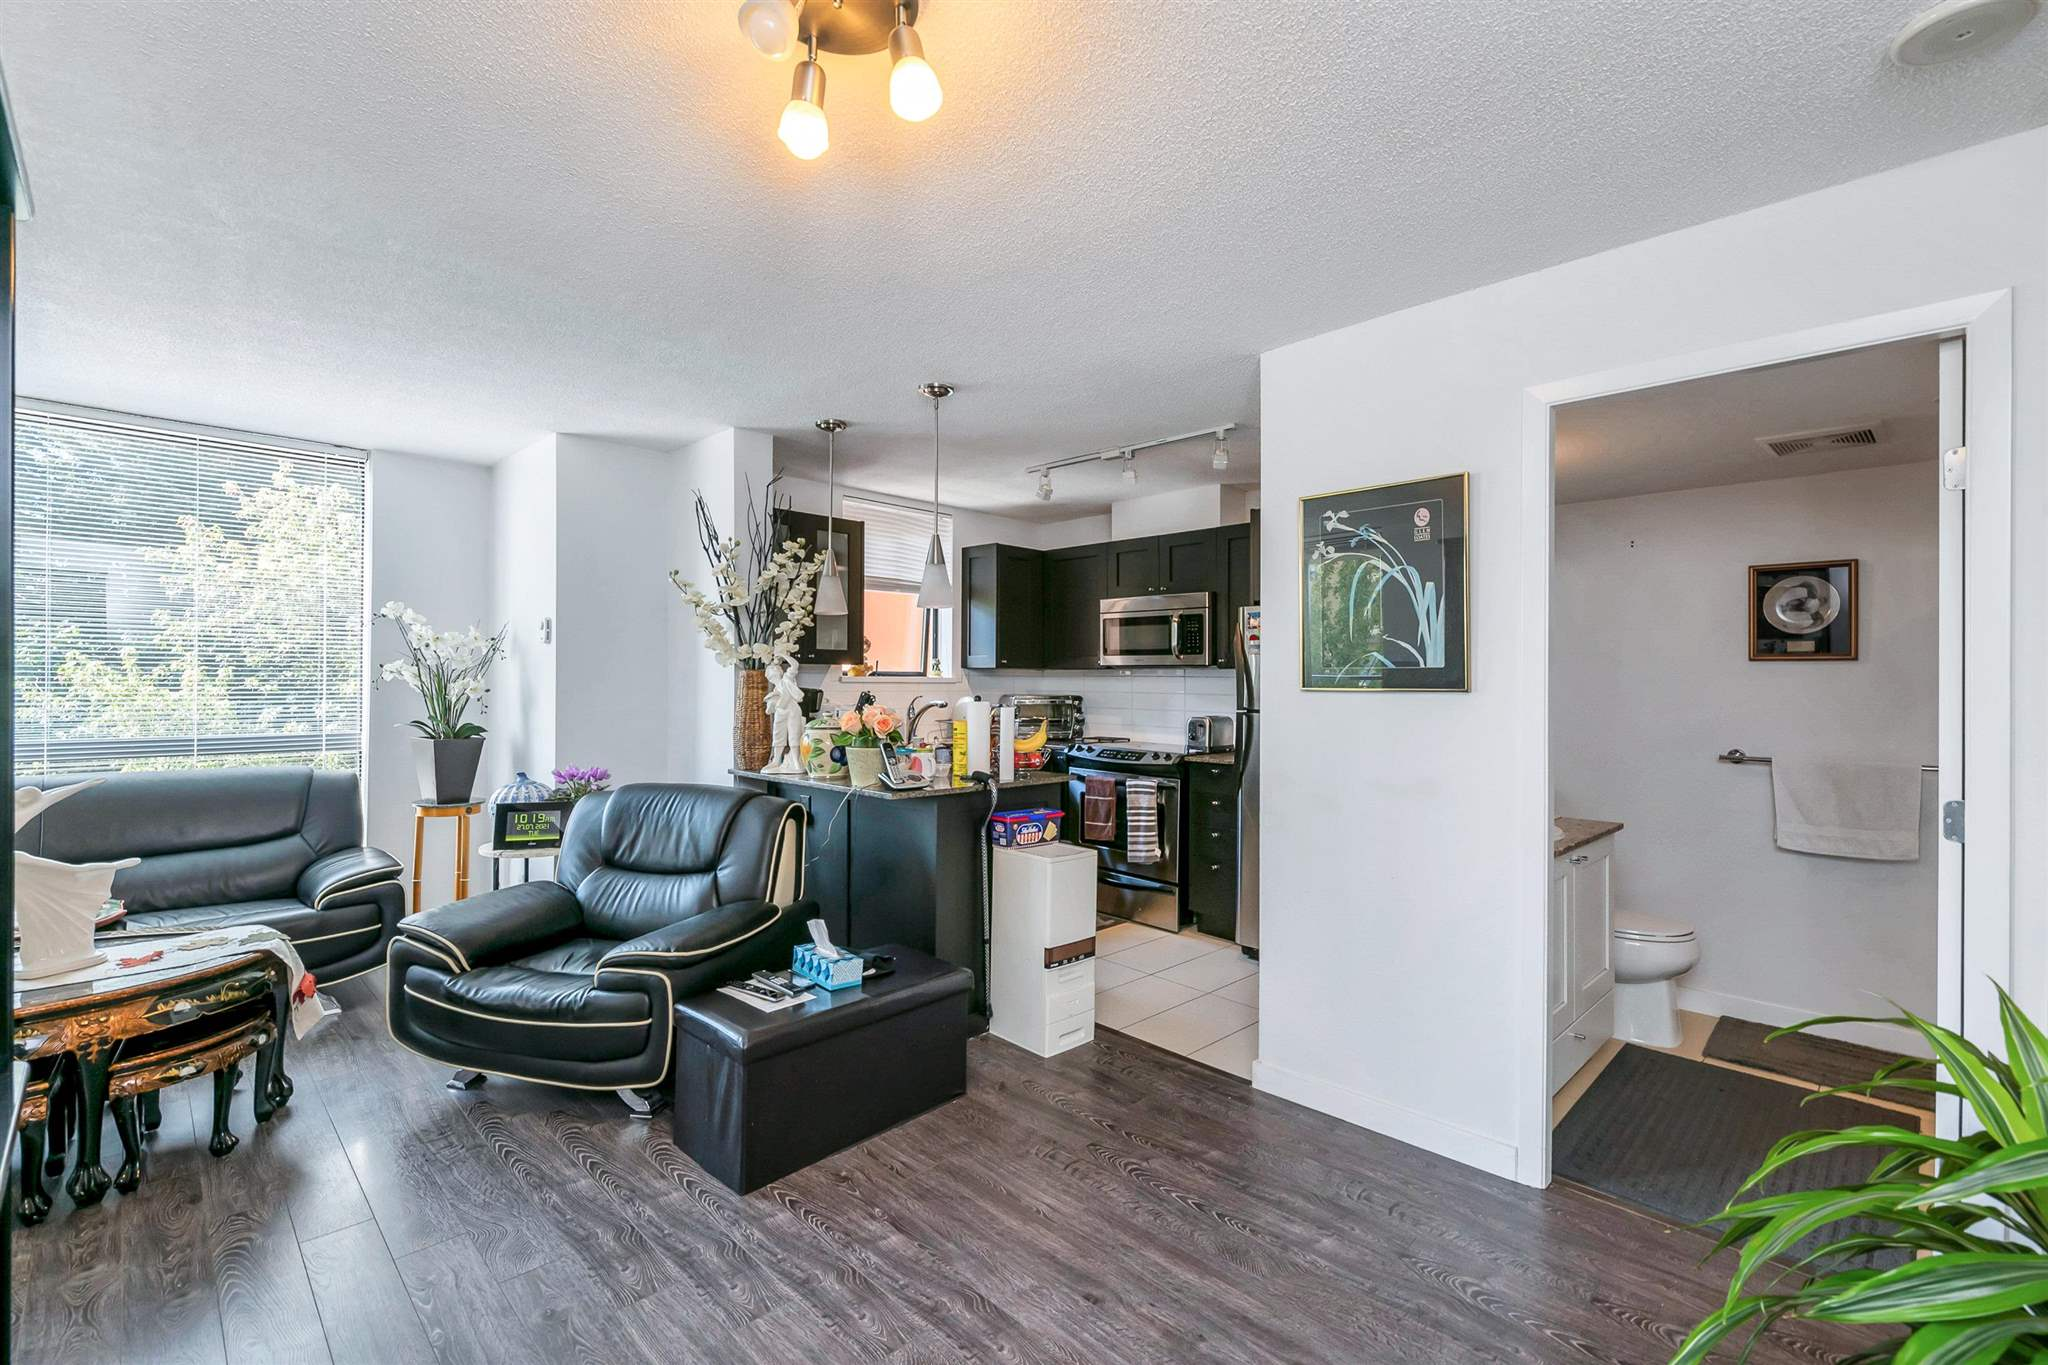 205 7225 ACORN AVENUE - Highgate Apartment/Condo for sale, 2 Bedrooms (R2606454) - #2